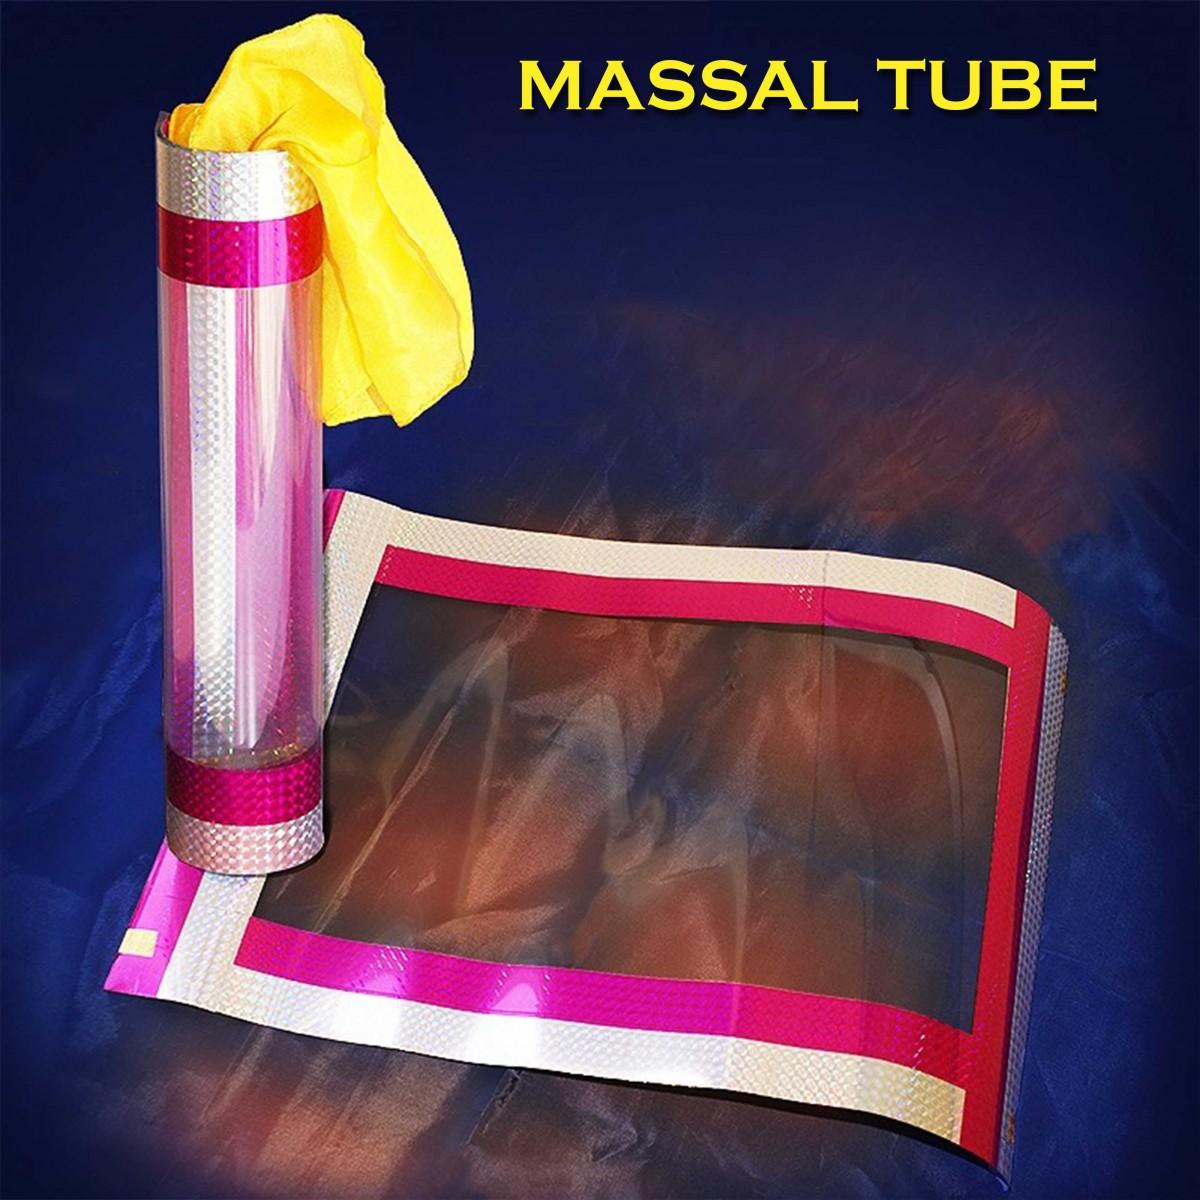 Massal Tube